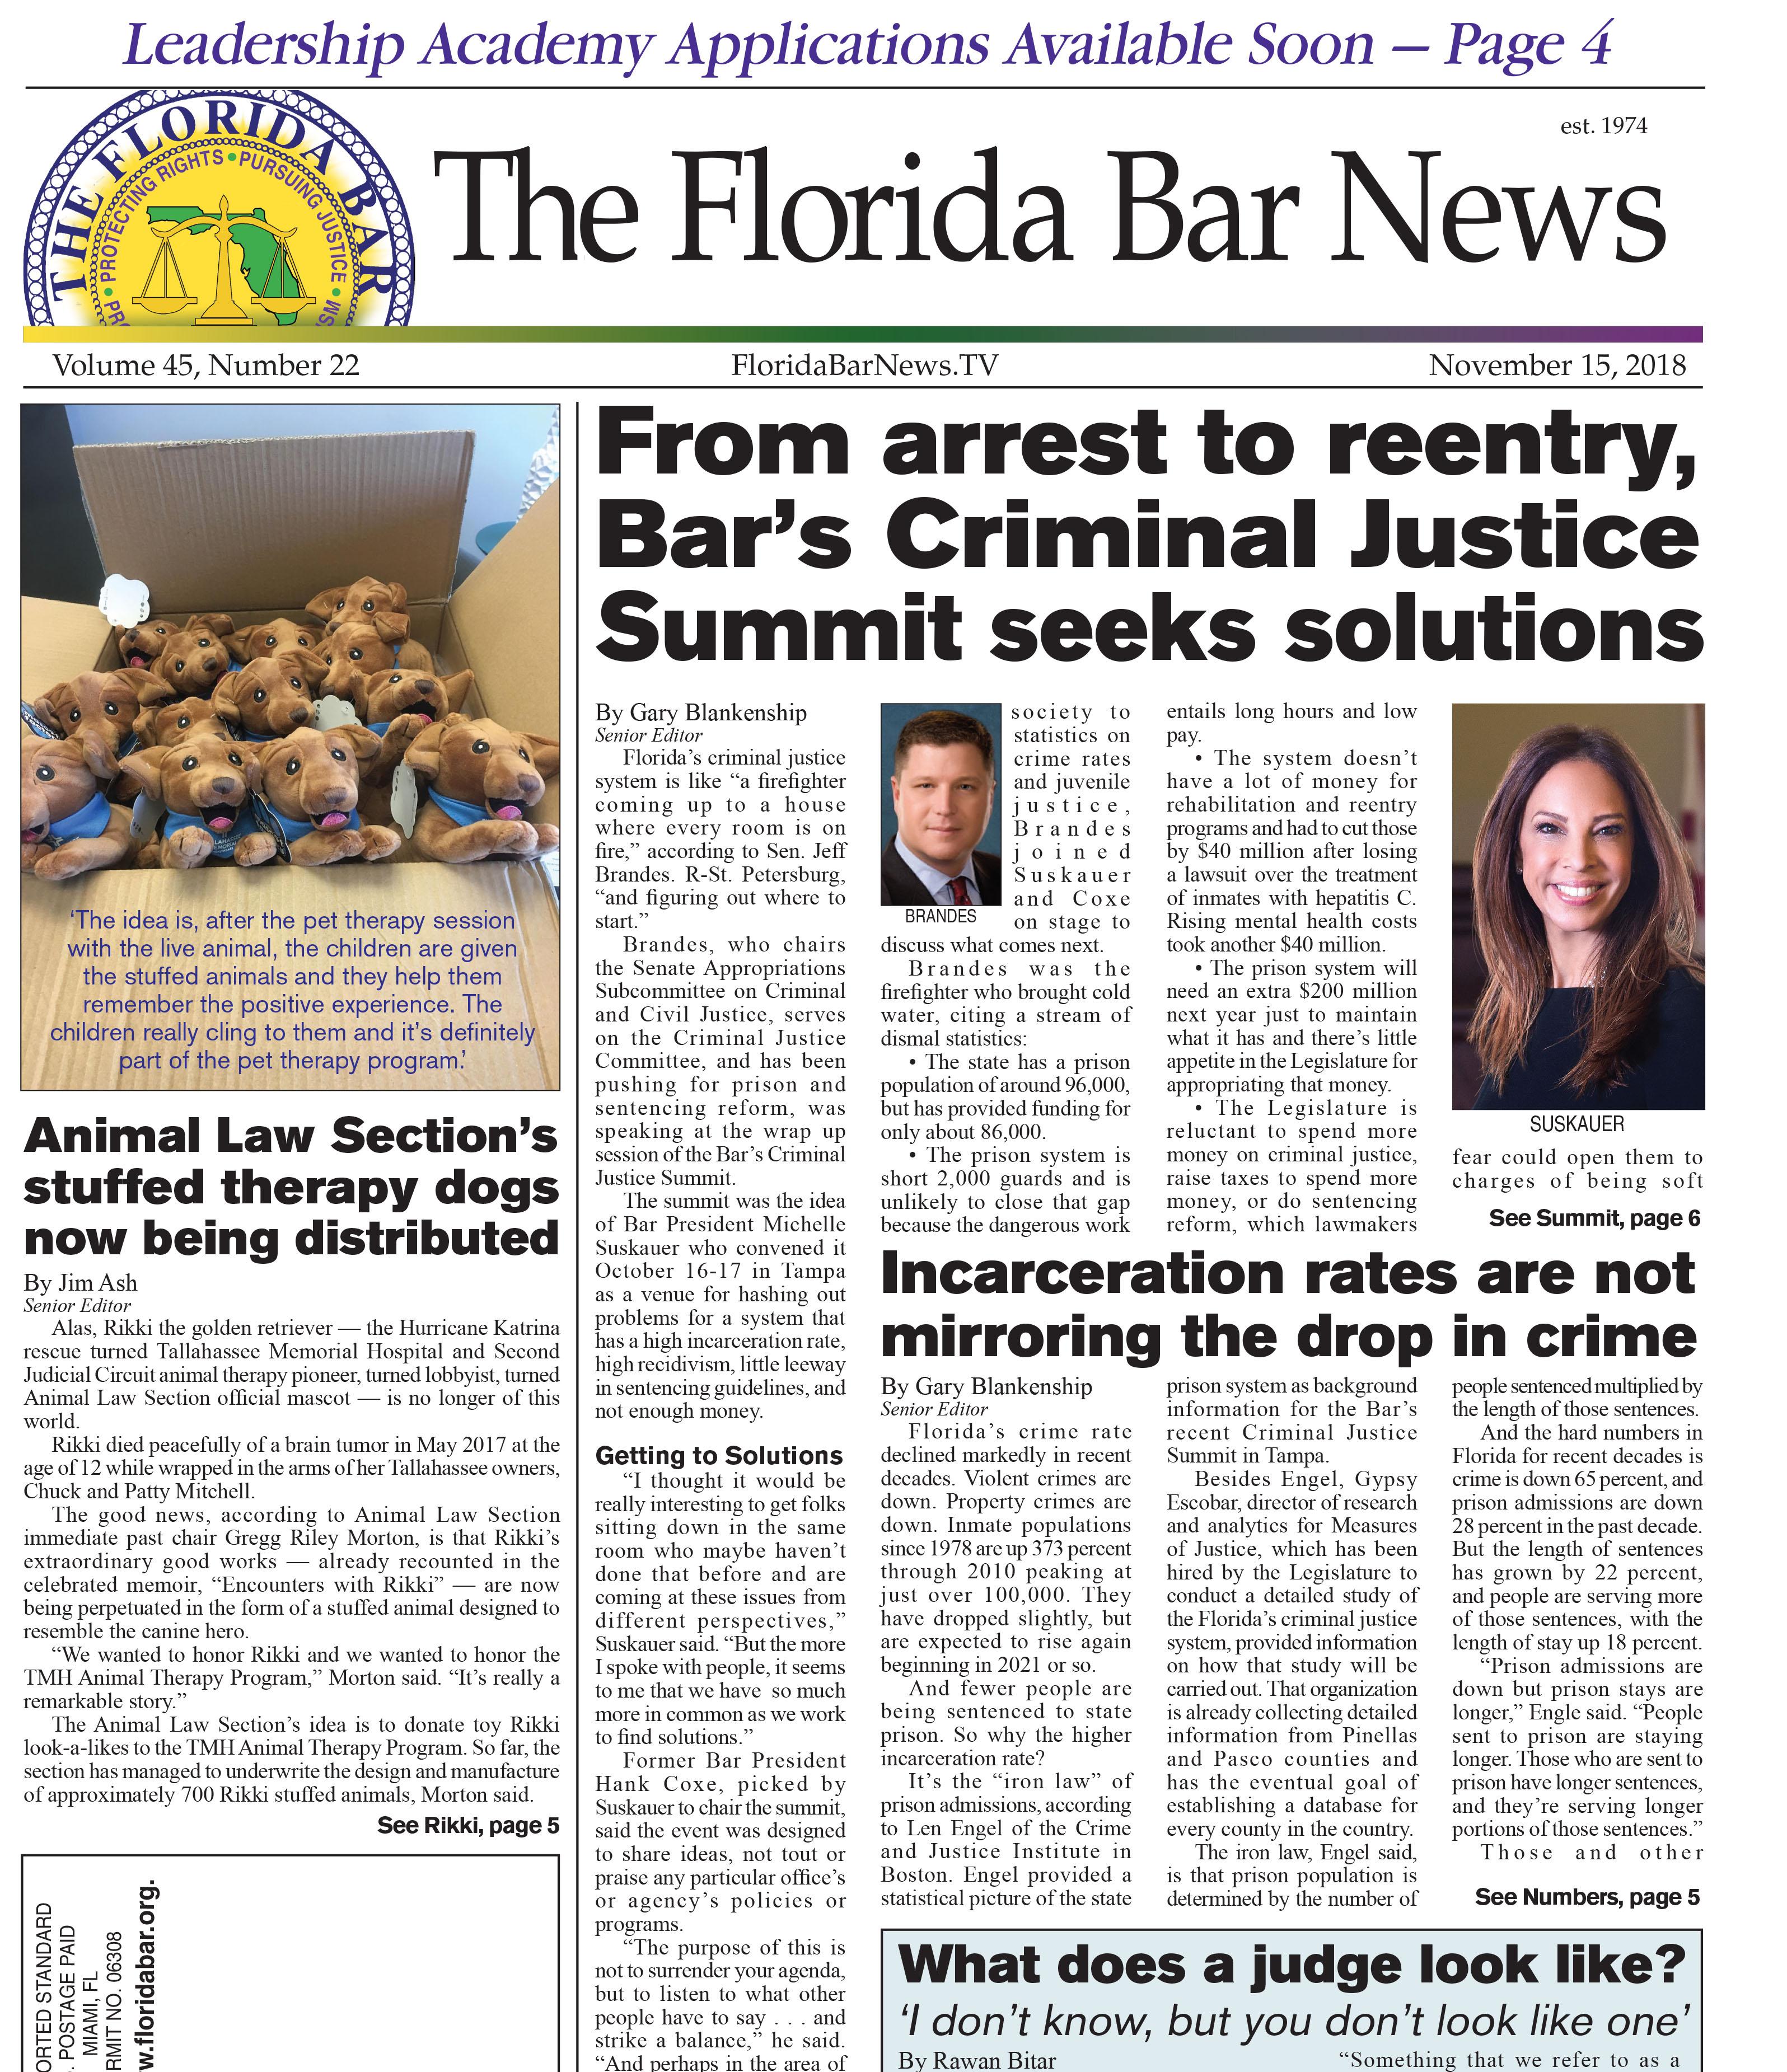 The Florida Bar News Nov. 15, 2018